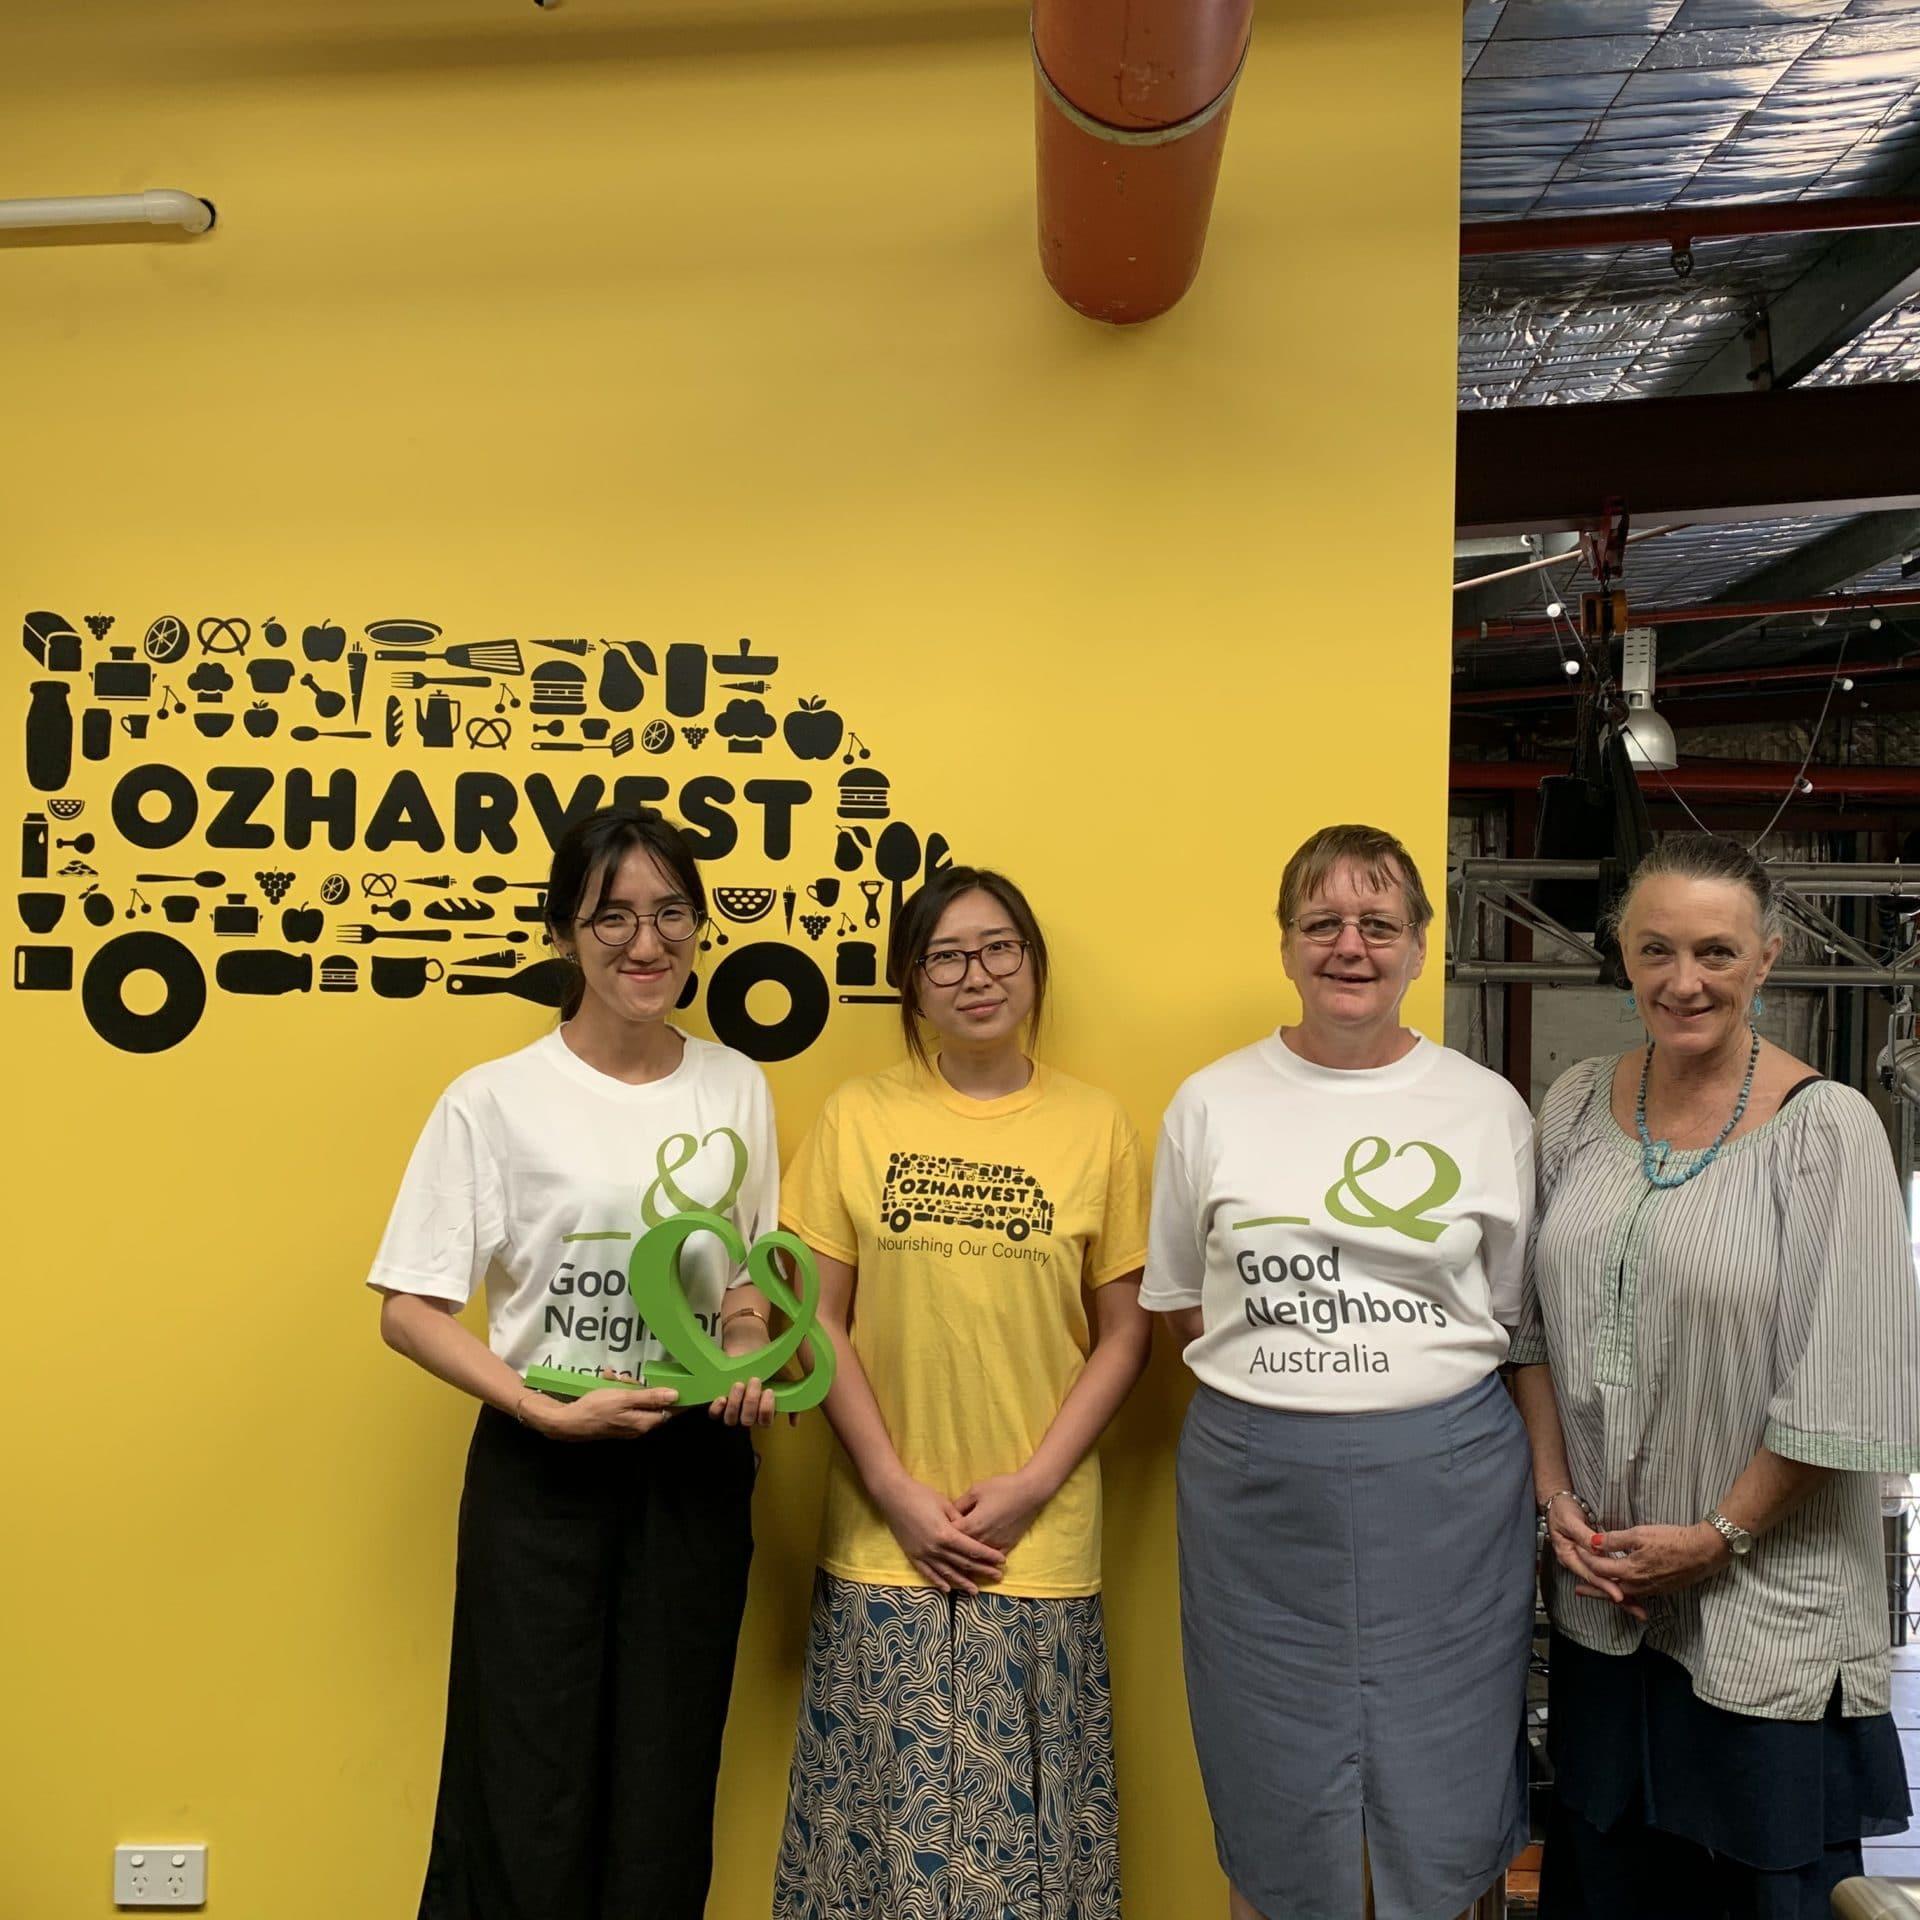 Good Neighbors Australia's members at OzHarvest